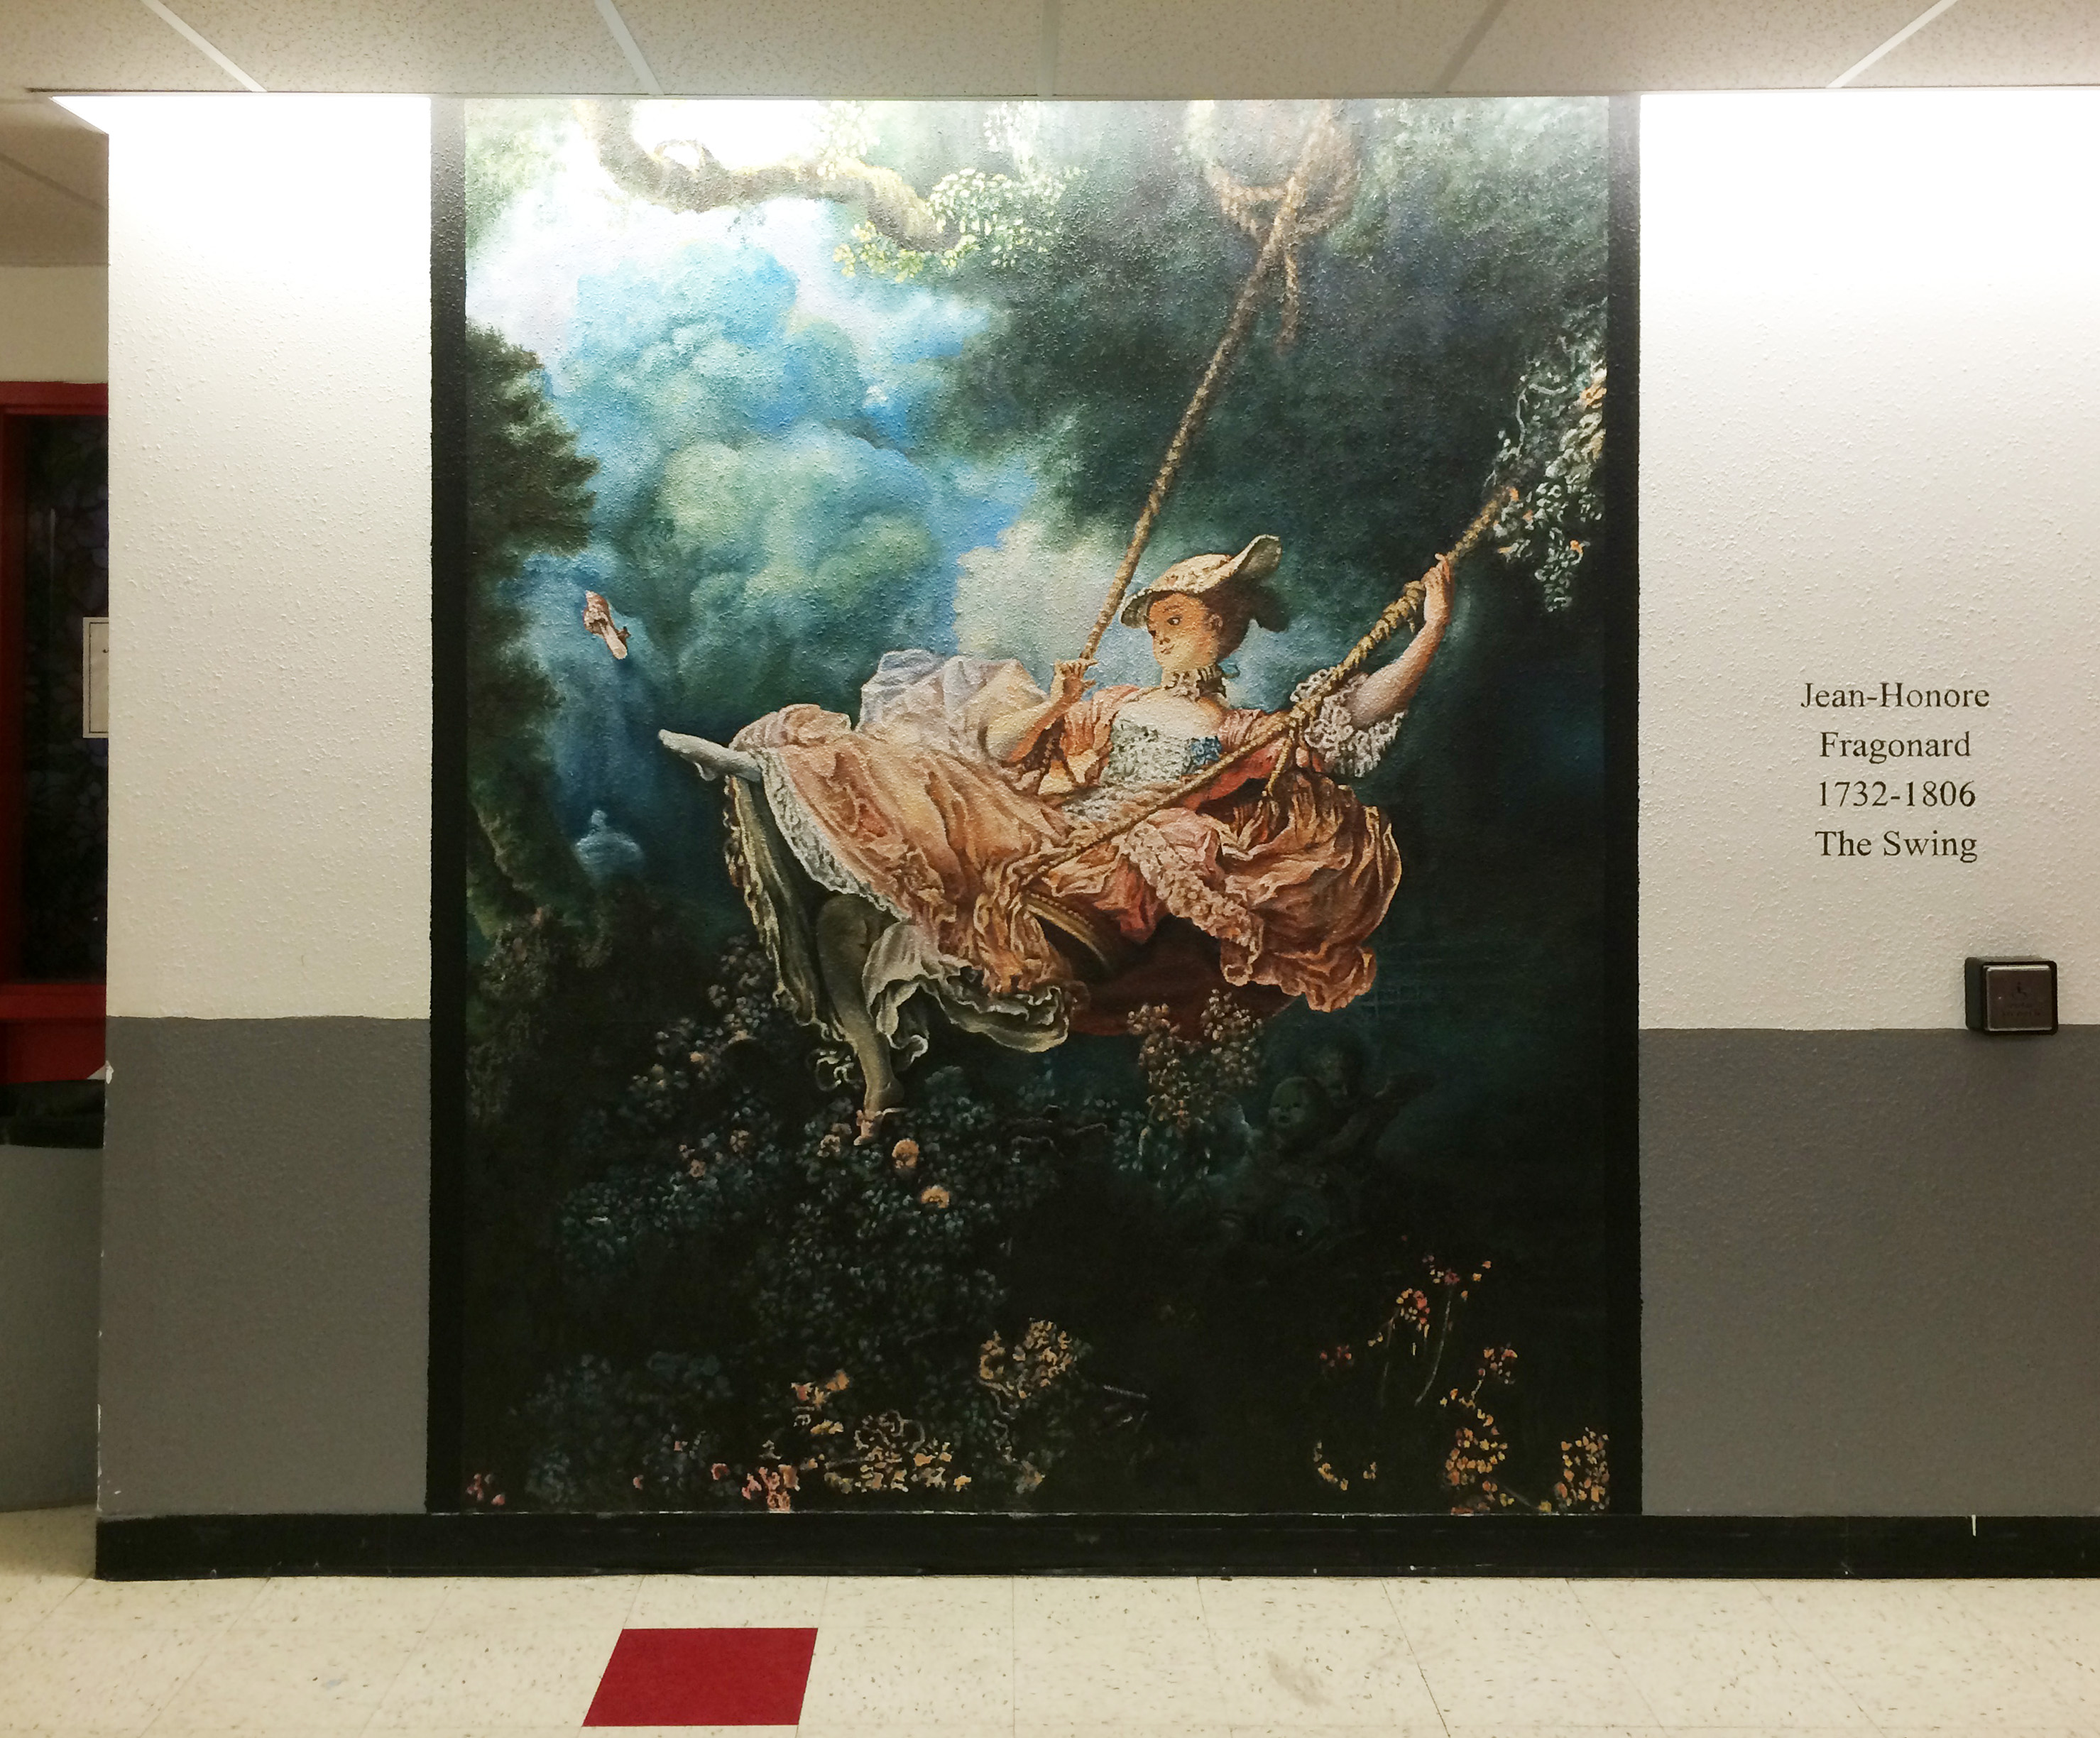 Mural: The Swing